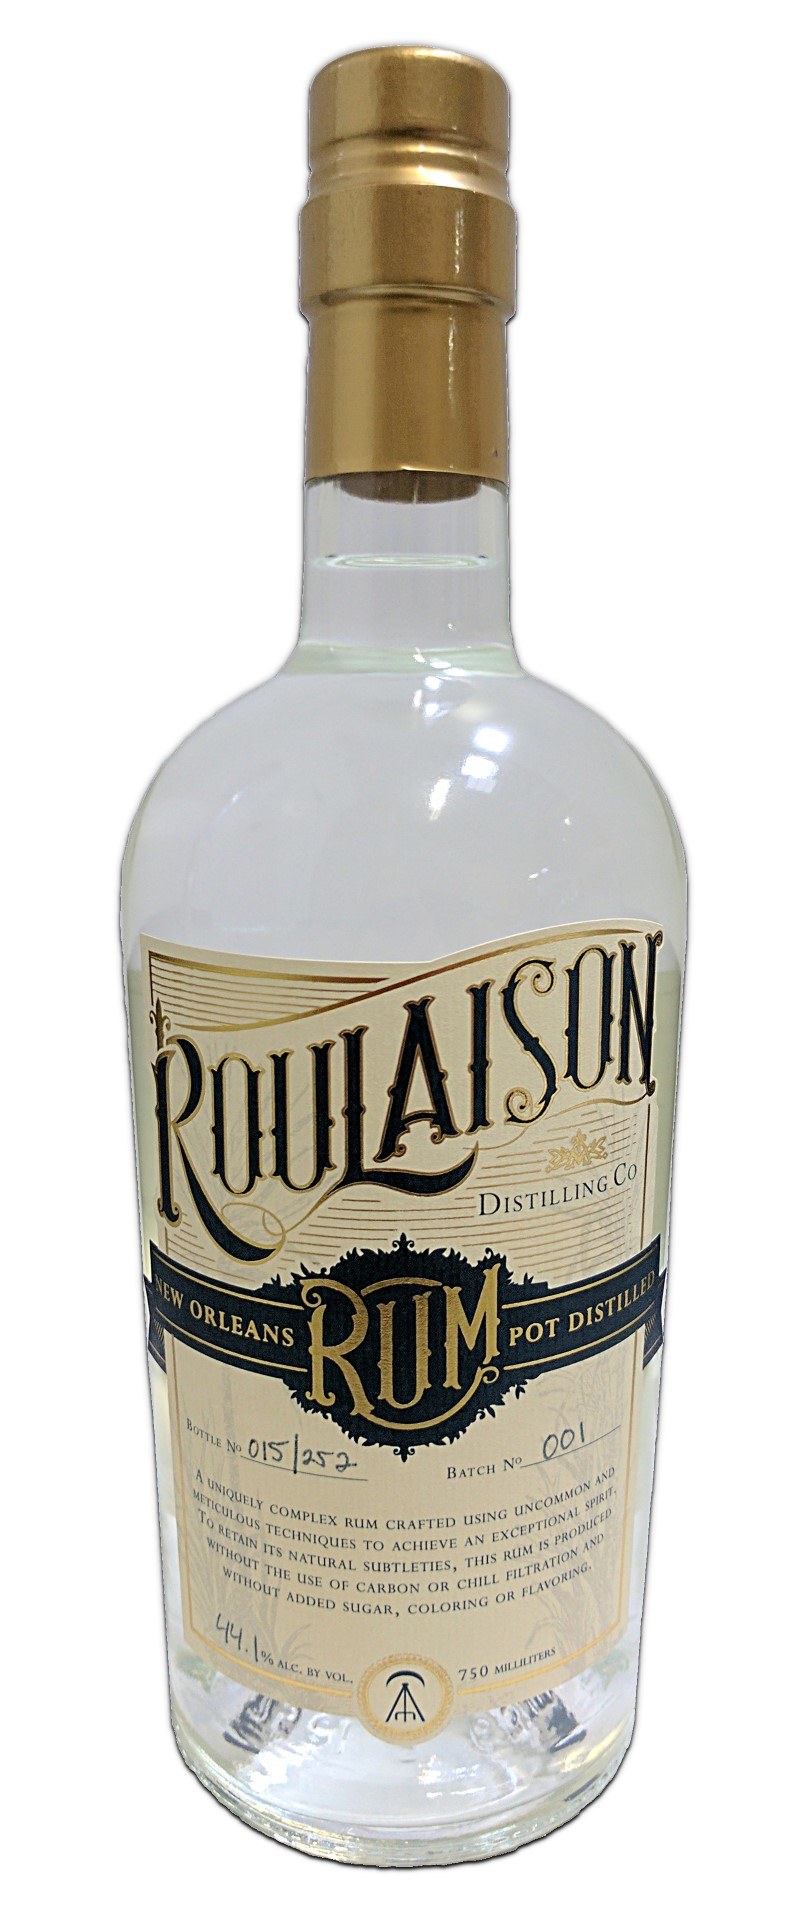 Roulaison Rum